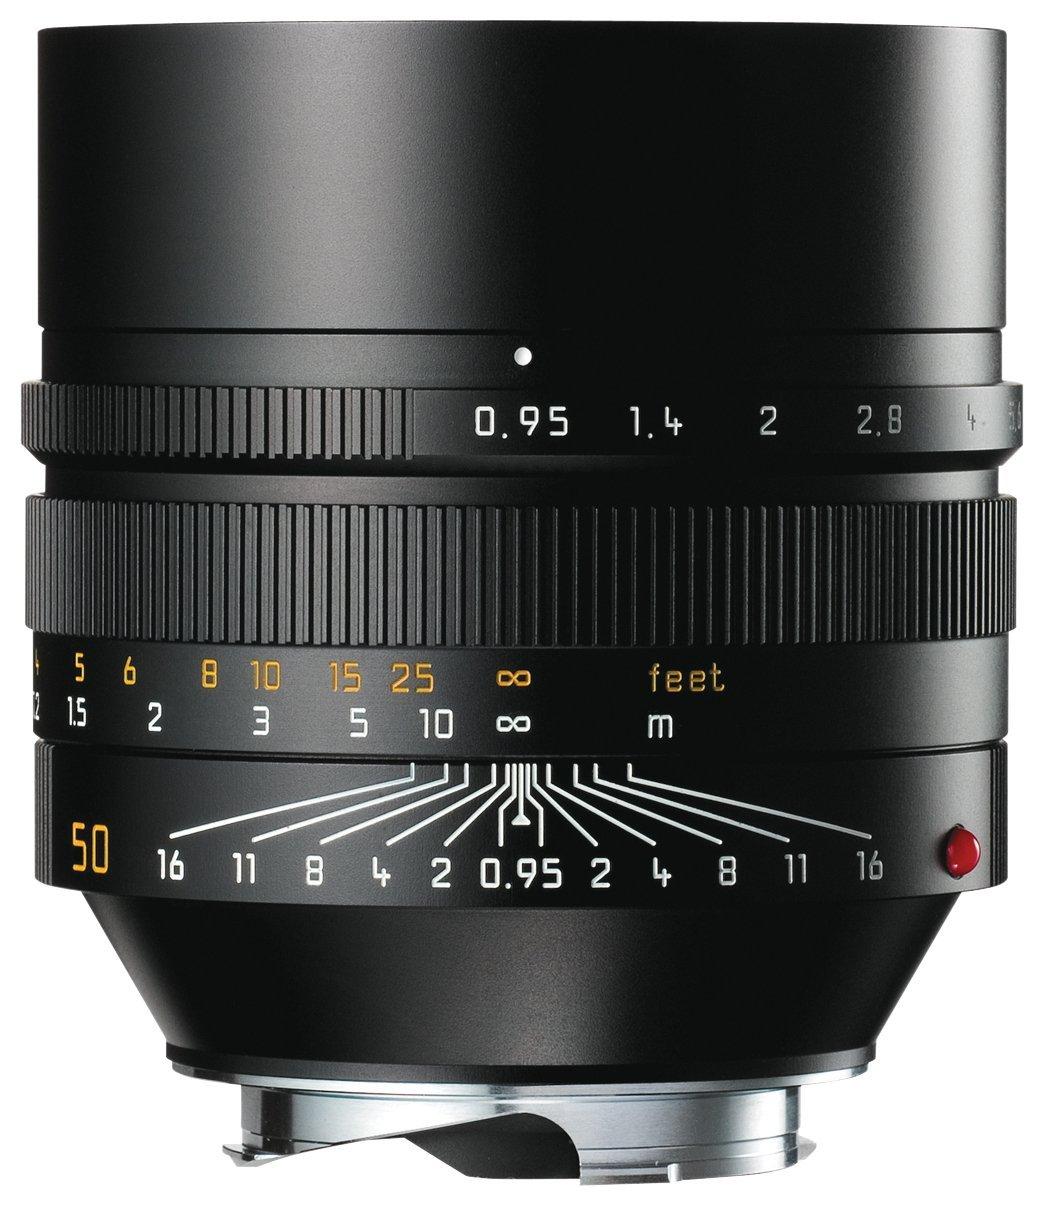 leica50mmf0.95 image